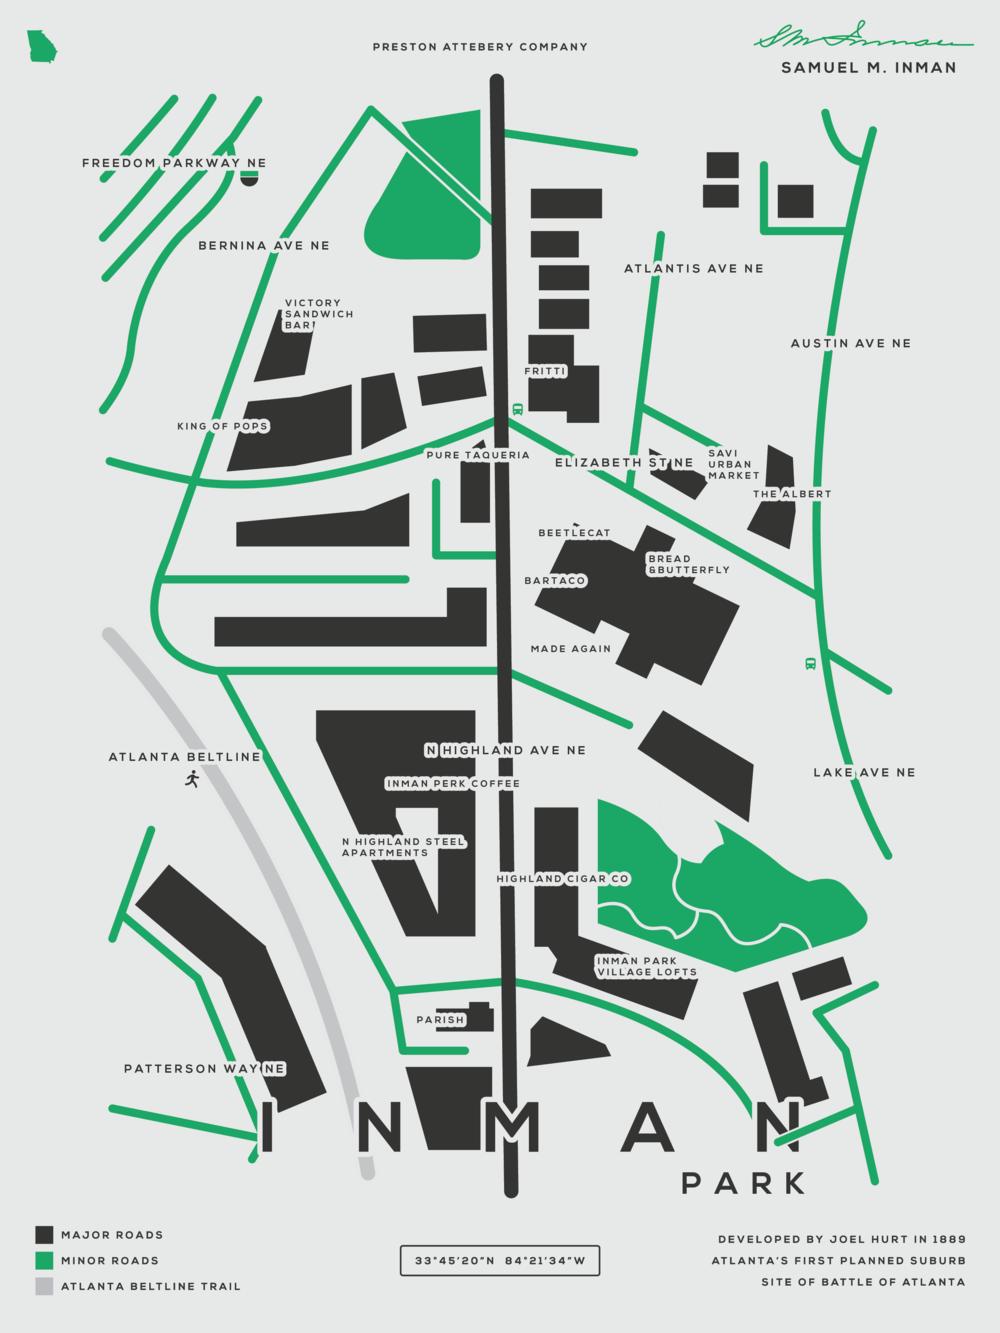 simplecity_maps_neighborhoods-01.png